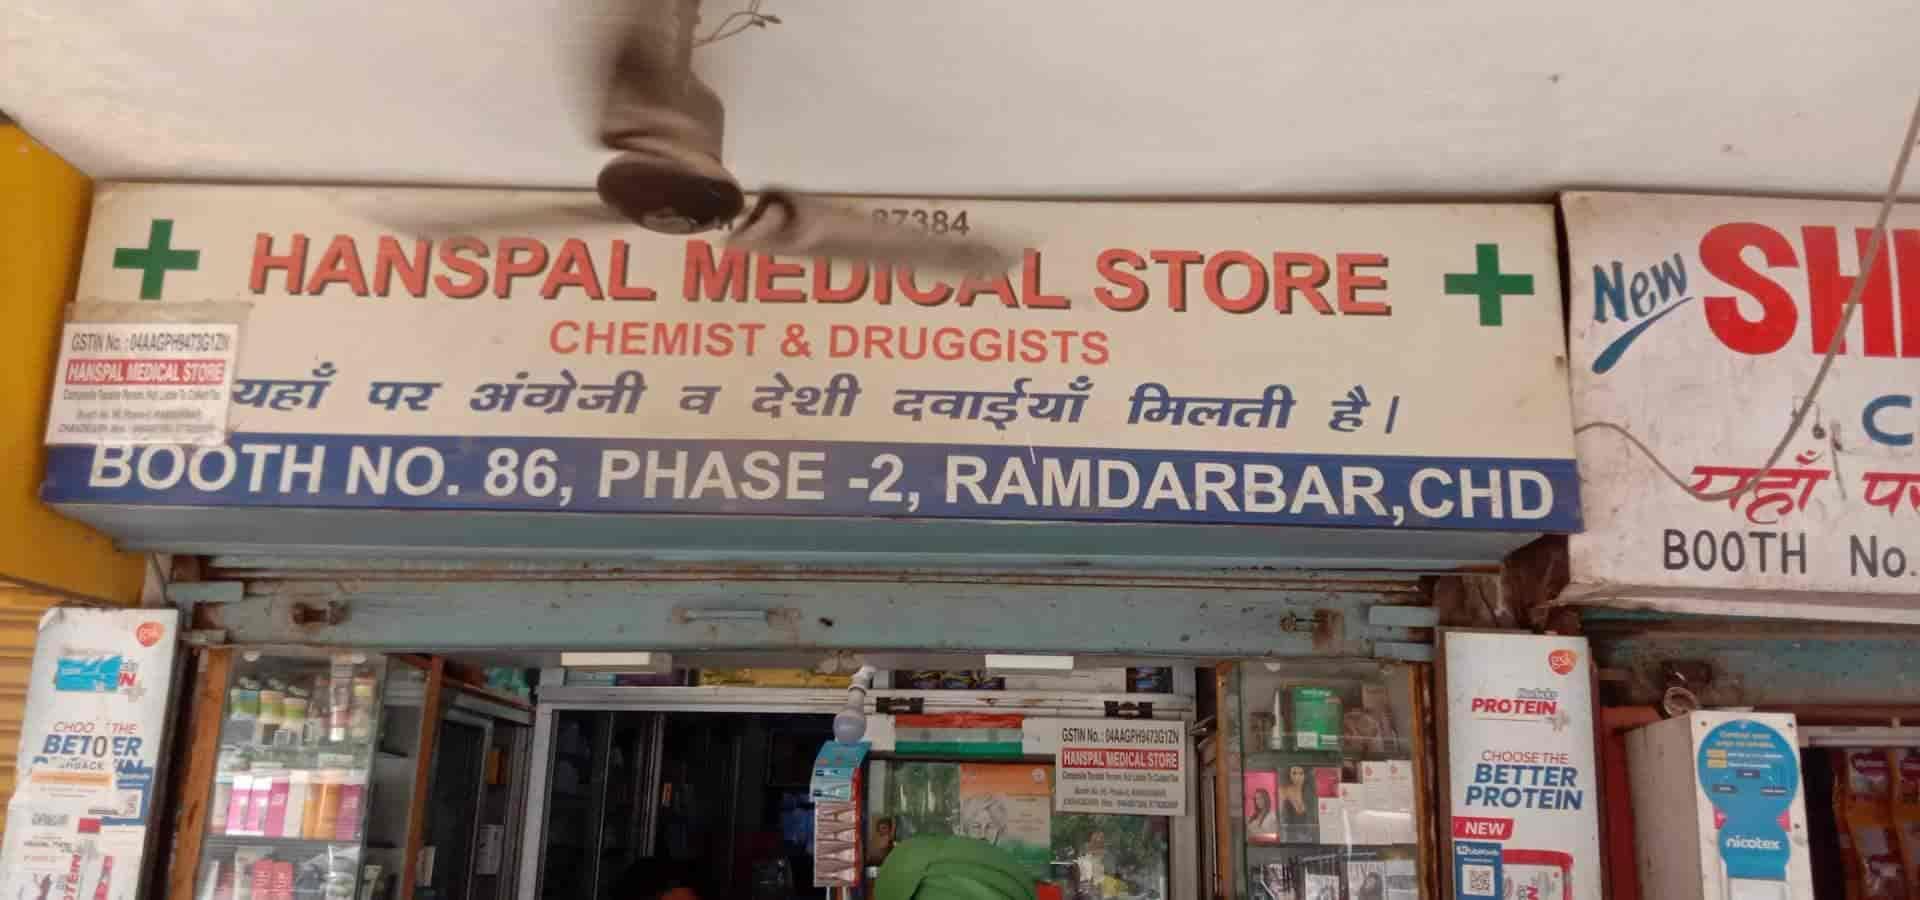 Hanspal Medical Store, Ramdarbar - Chemists in Chandigarh